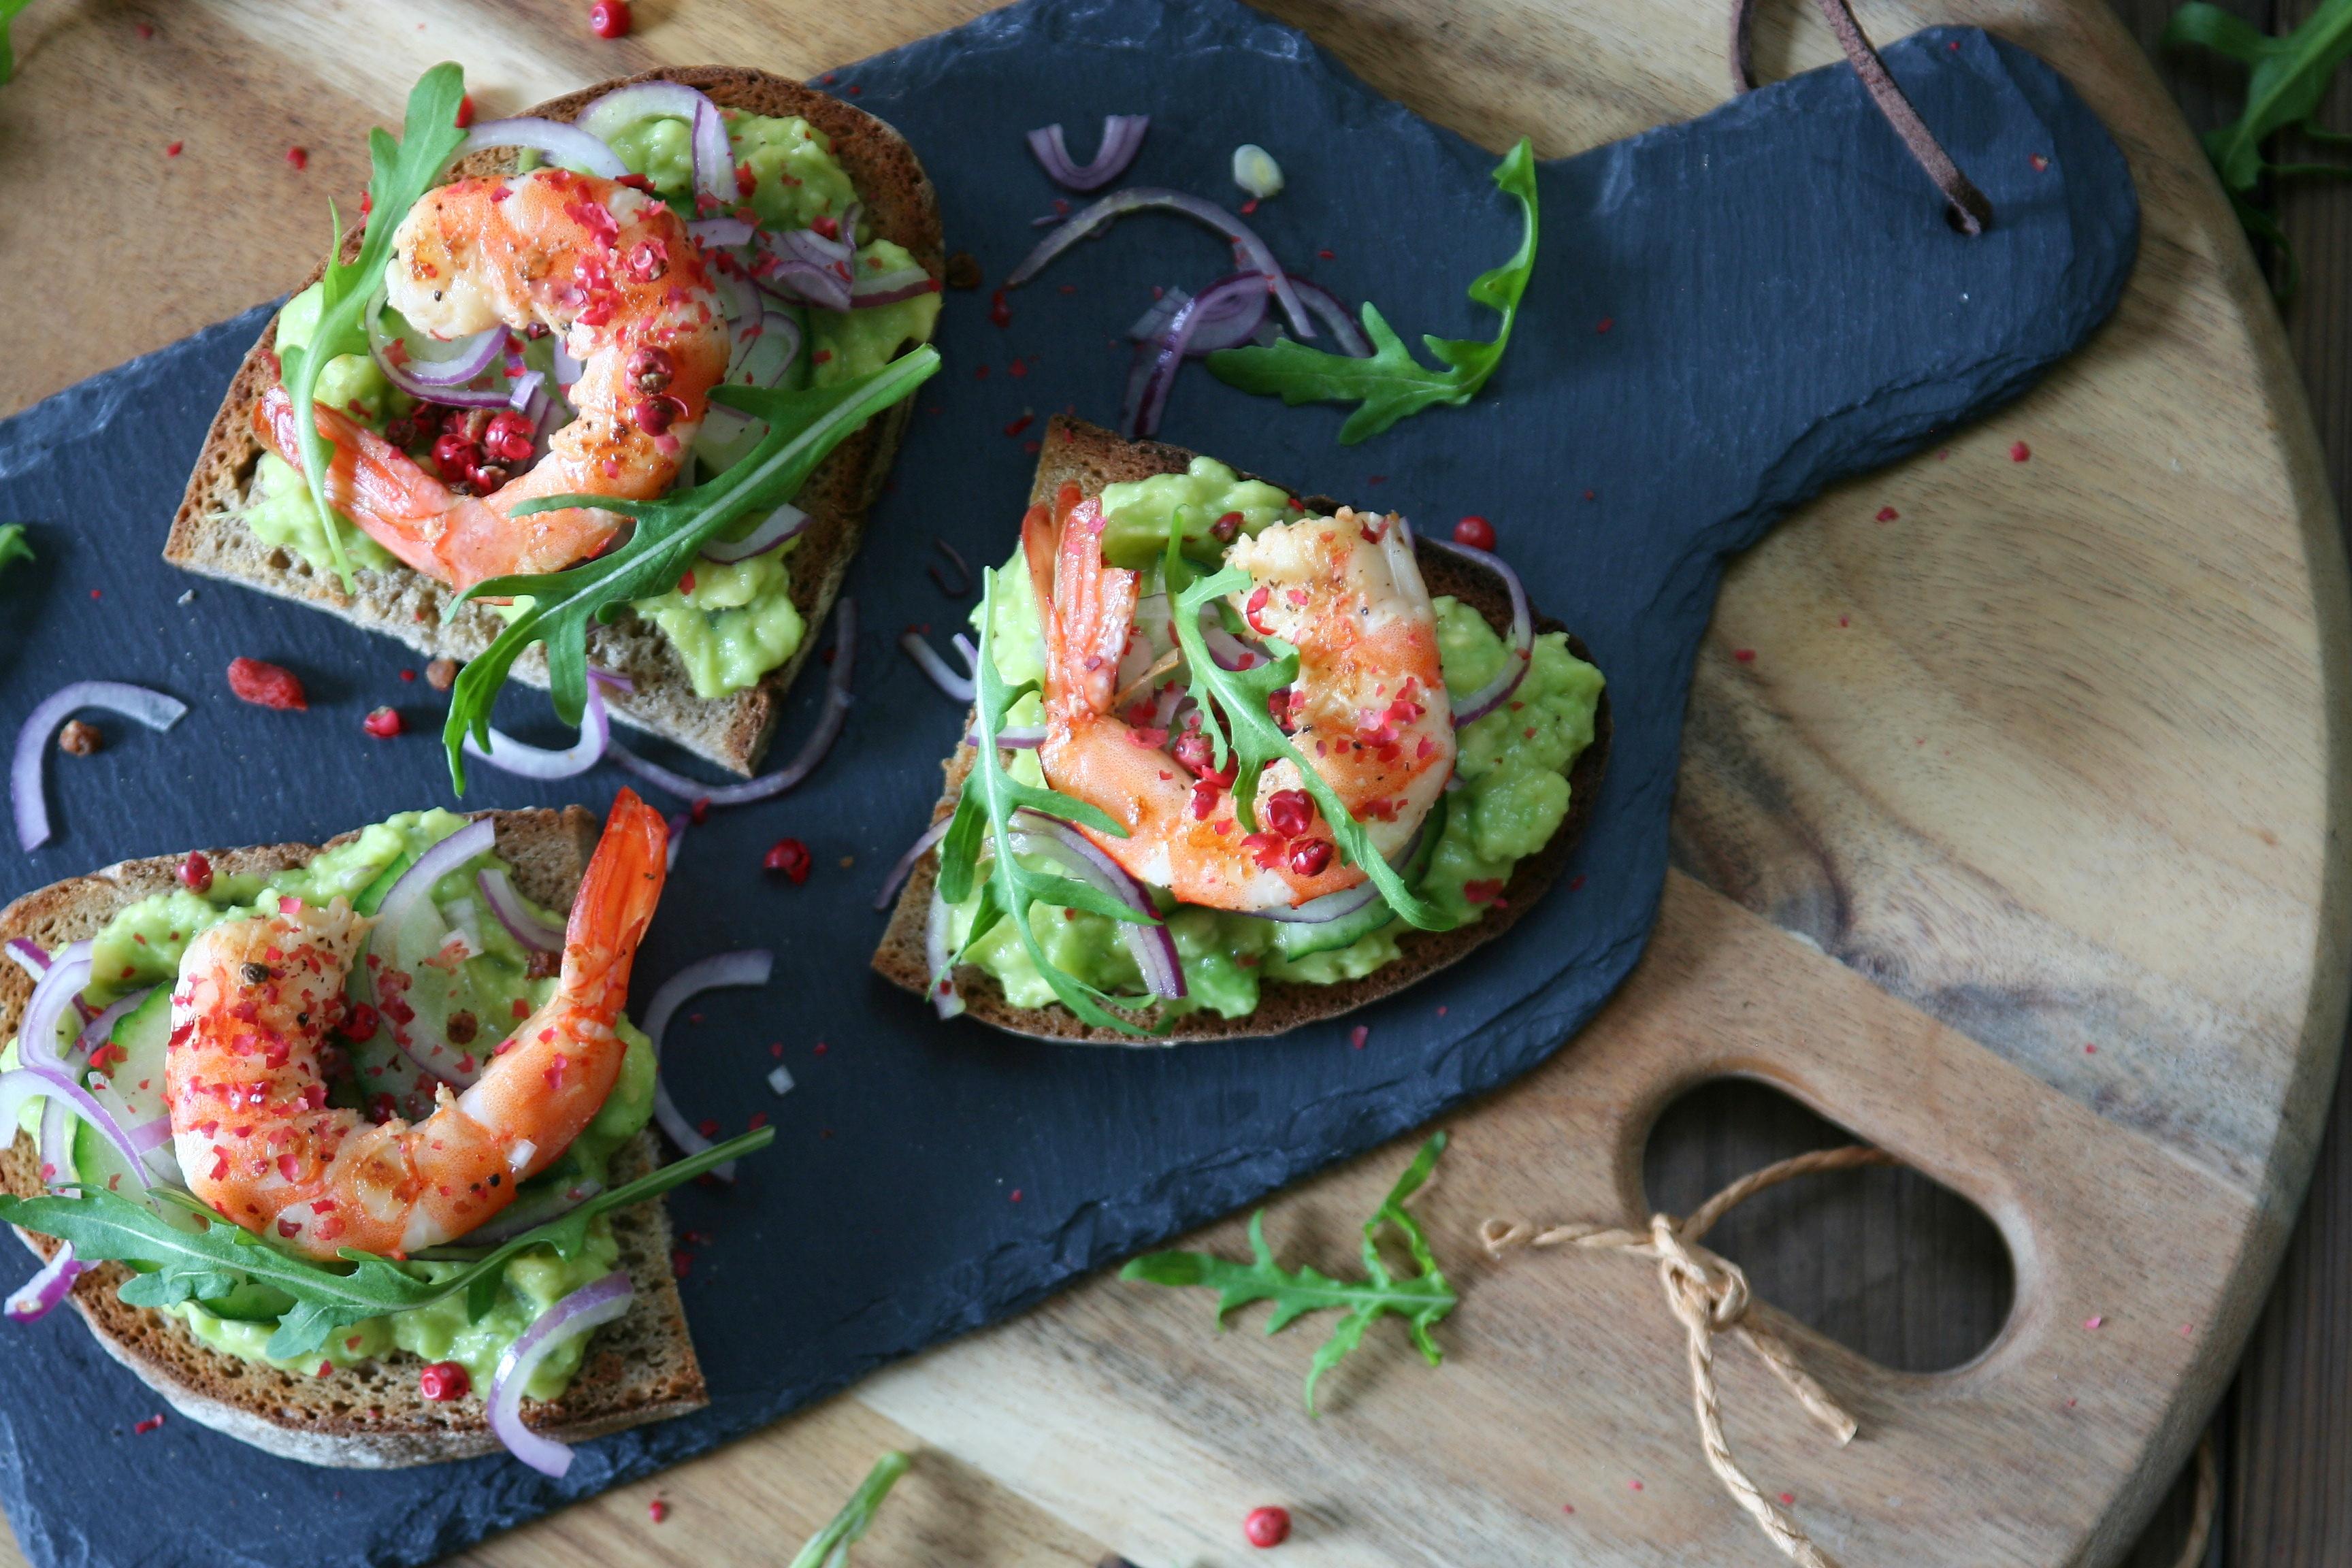 Toustíky s avokádovou pomazánkou a krevetami